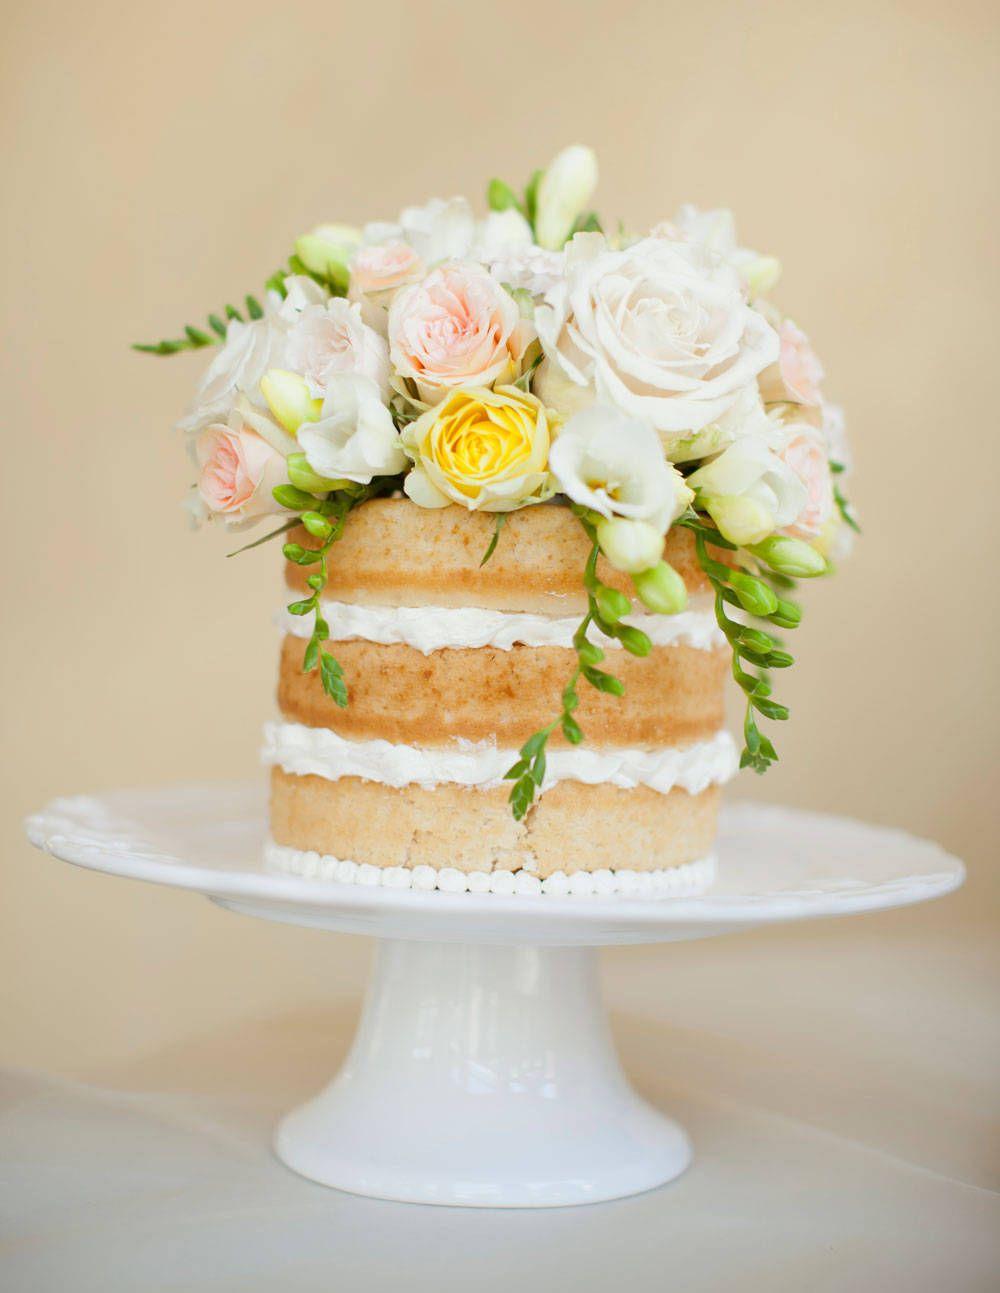 Trendküchen frosting optional wedding cakes wedding cake cake and wedding